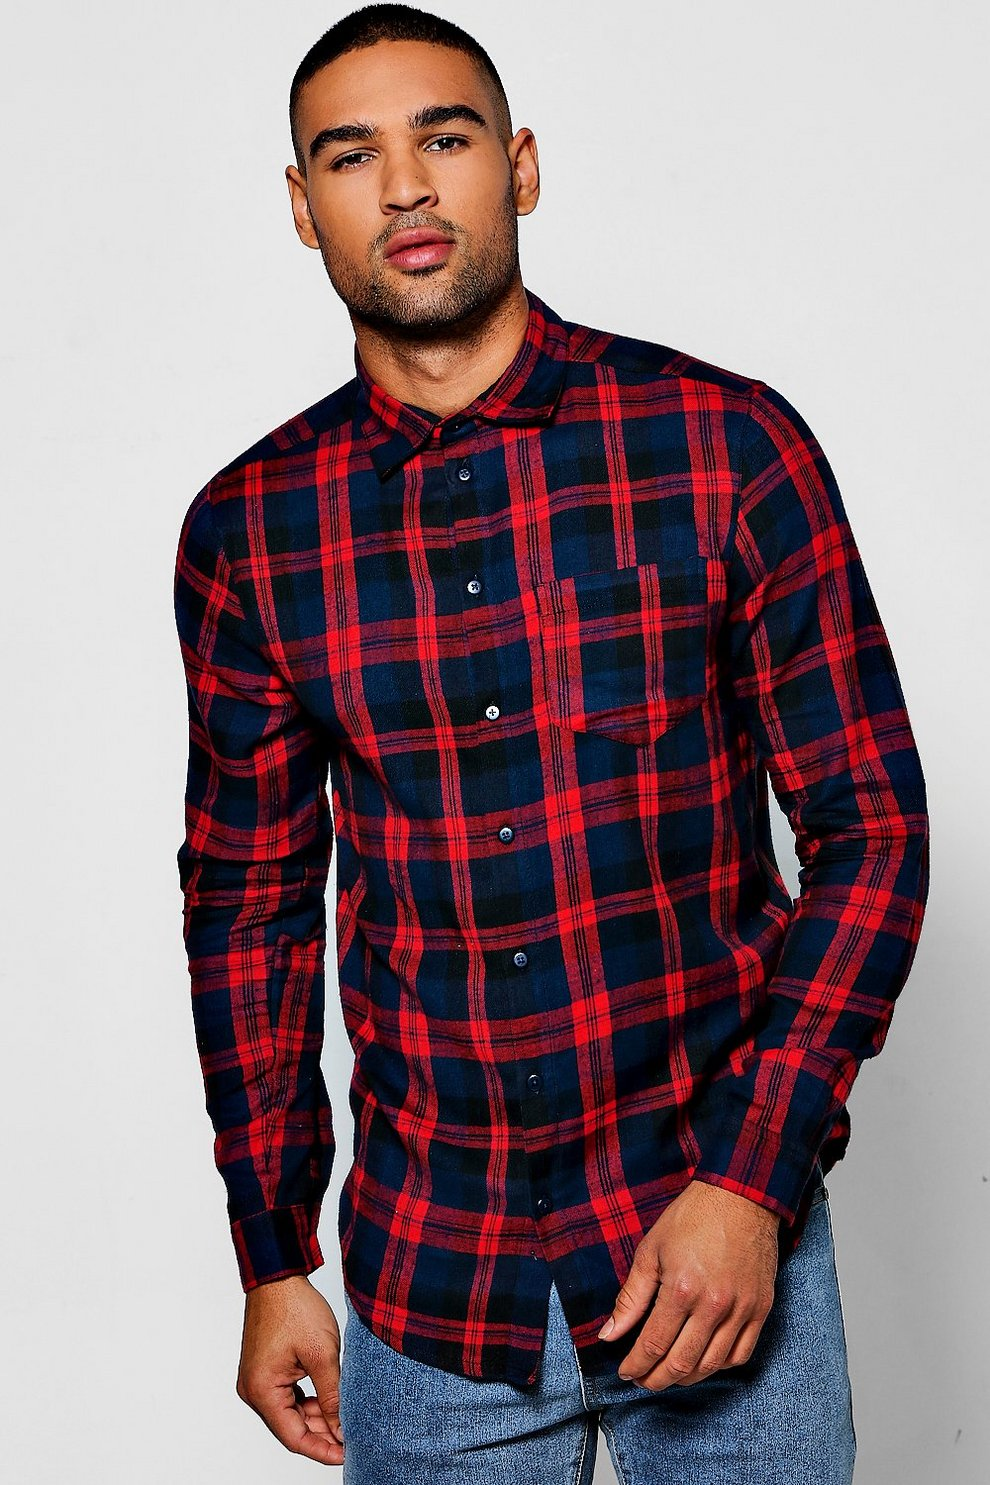 b73a4c5499da24 camicia rossa a quadri con maniche lunghe   Boohoo